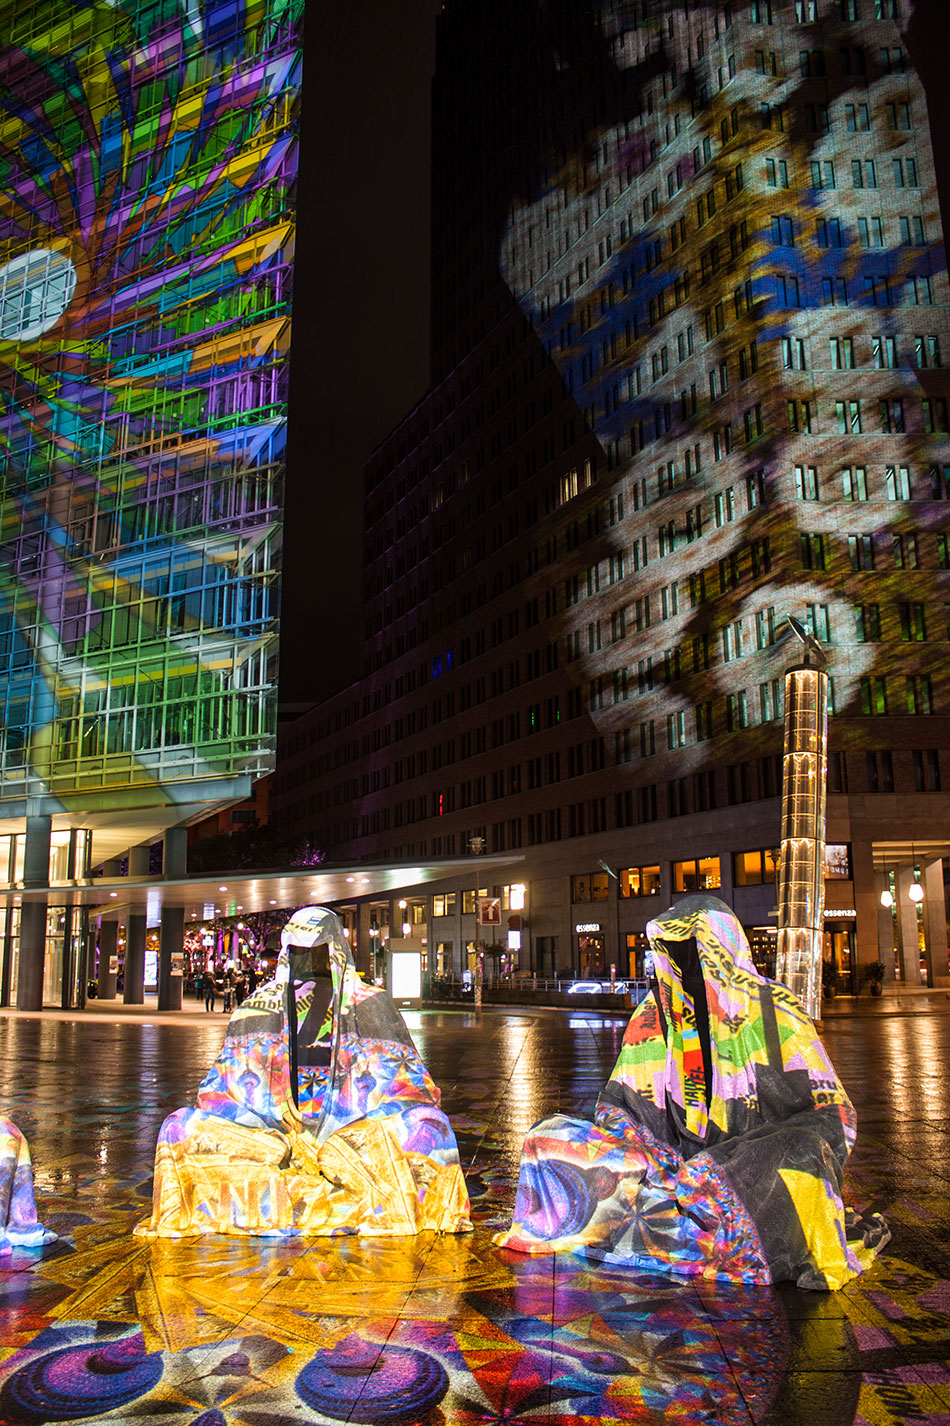 festival-of-lights-berlin-light-art-festival-contemporary-fine-art-design-show-large-scale-sculpture-guardiansof-time-manfred-kili-kielnhofer-sculpture-3860